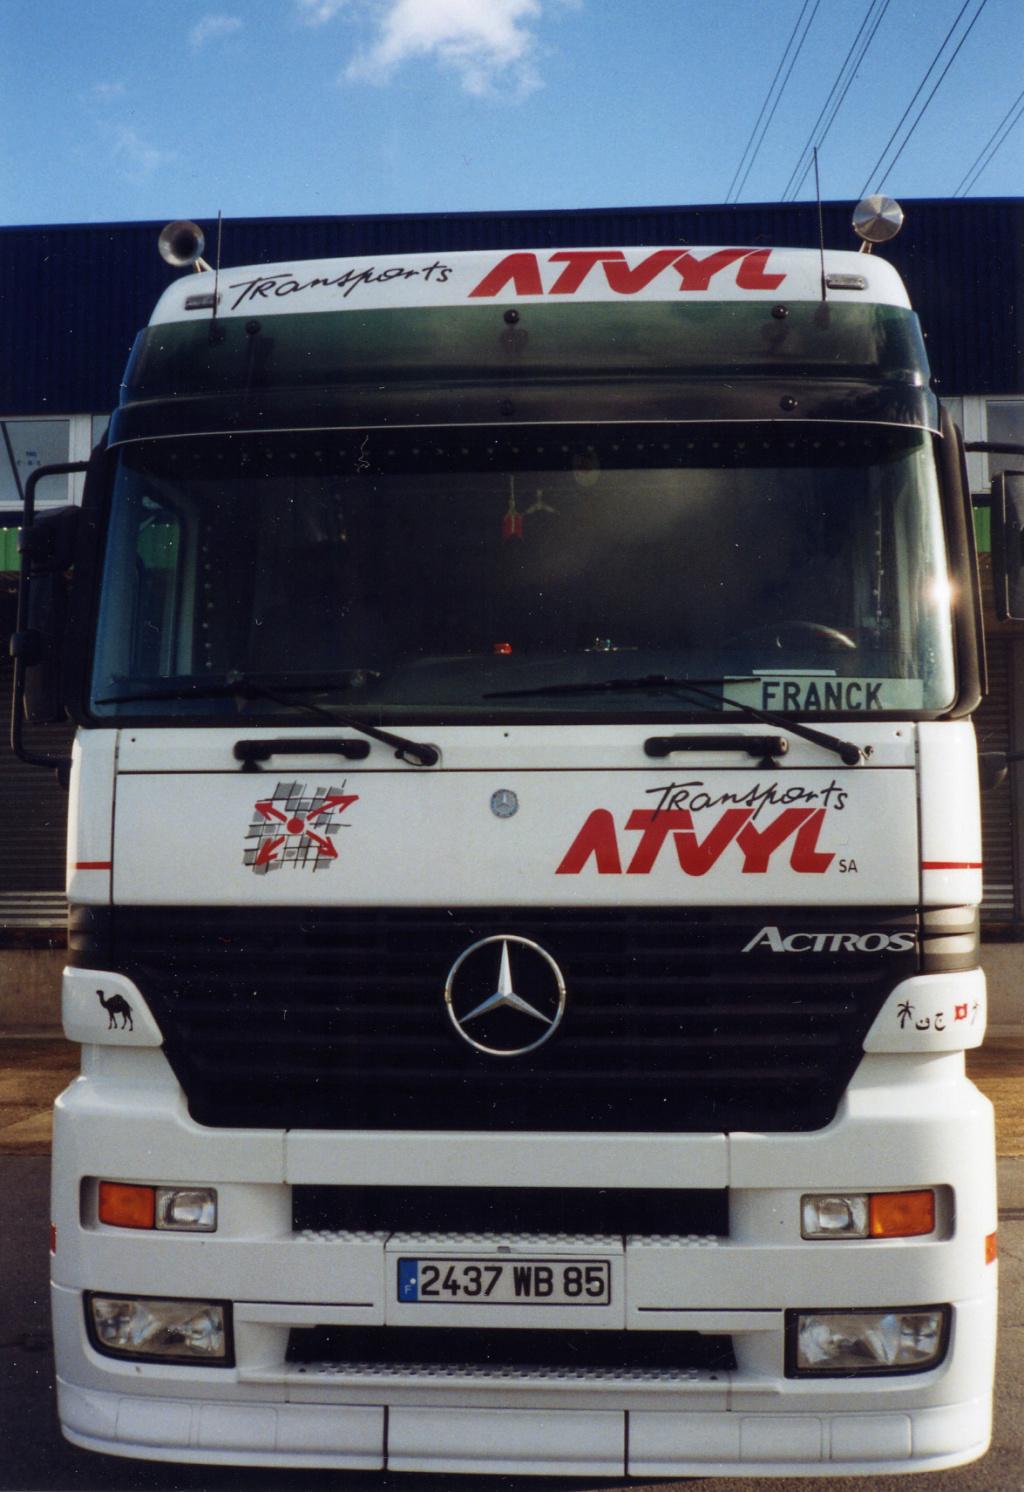 Transports Atvyl (85) Atvyl_10